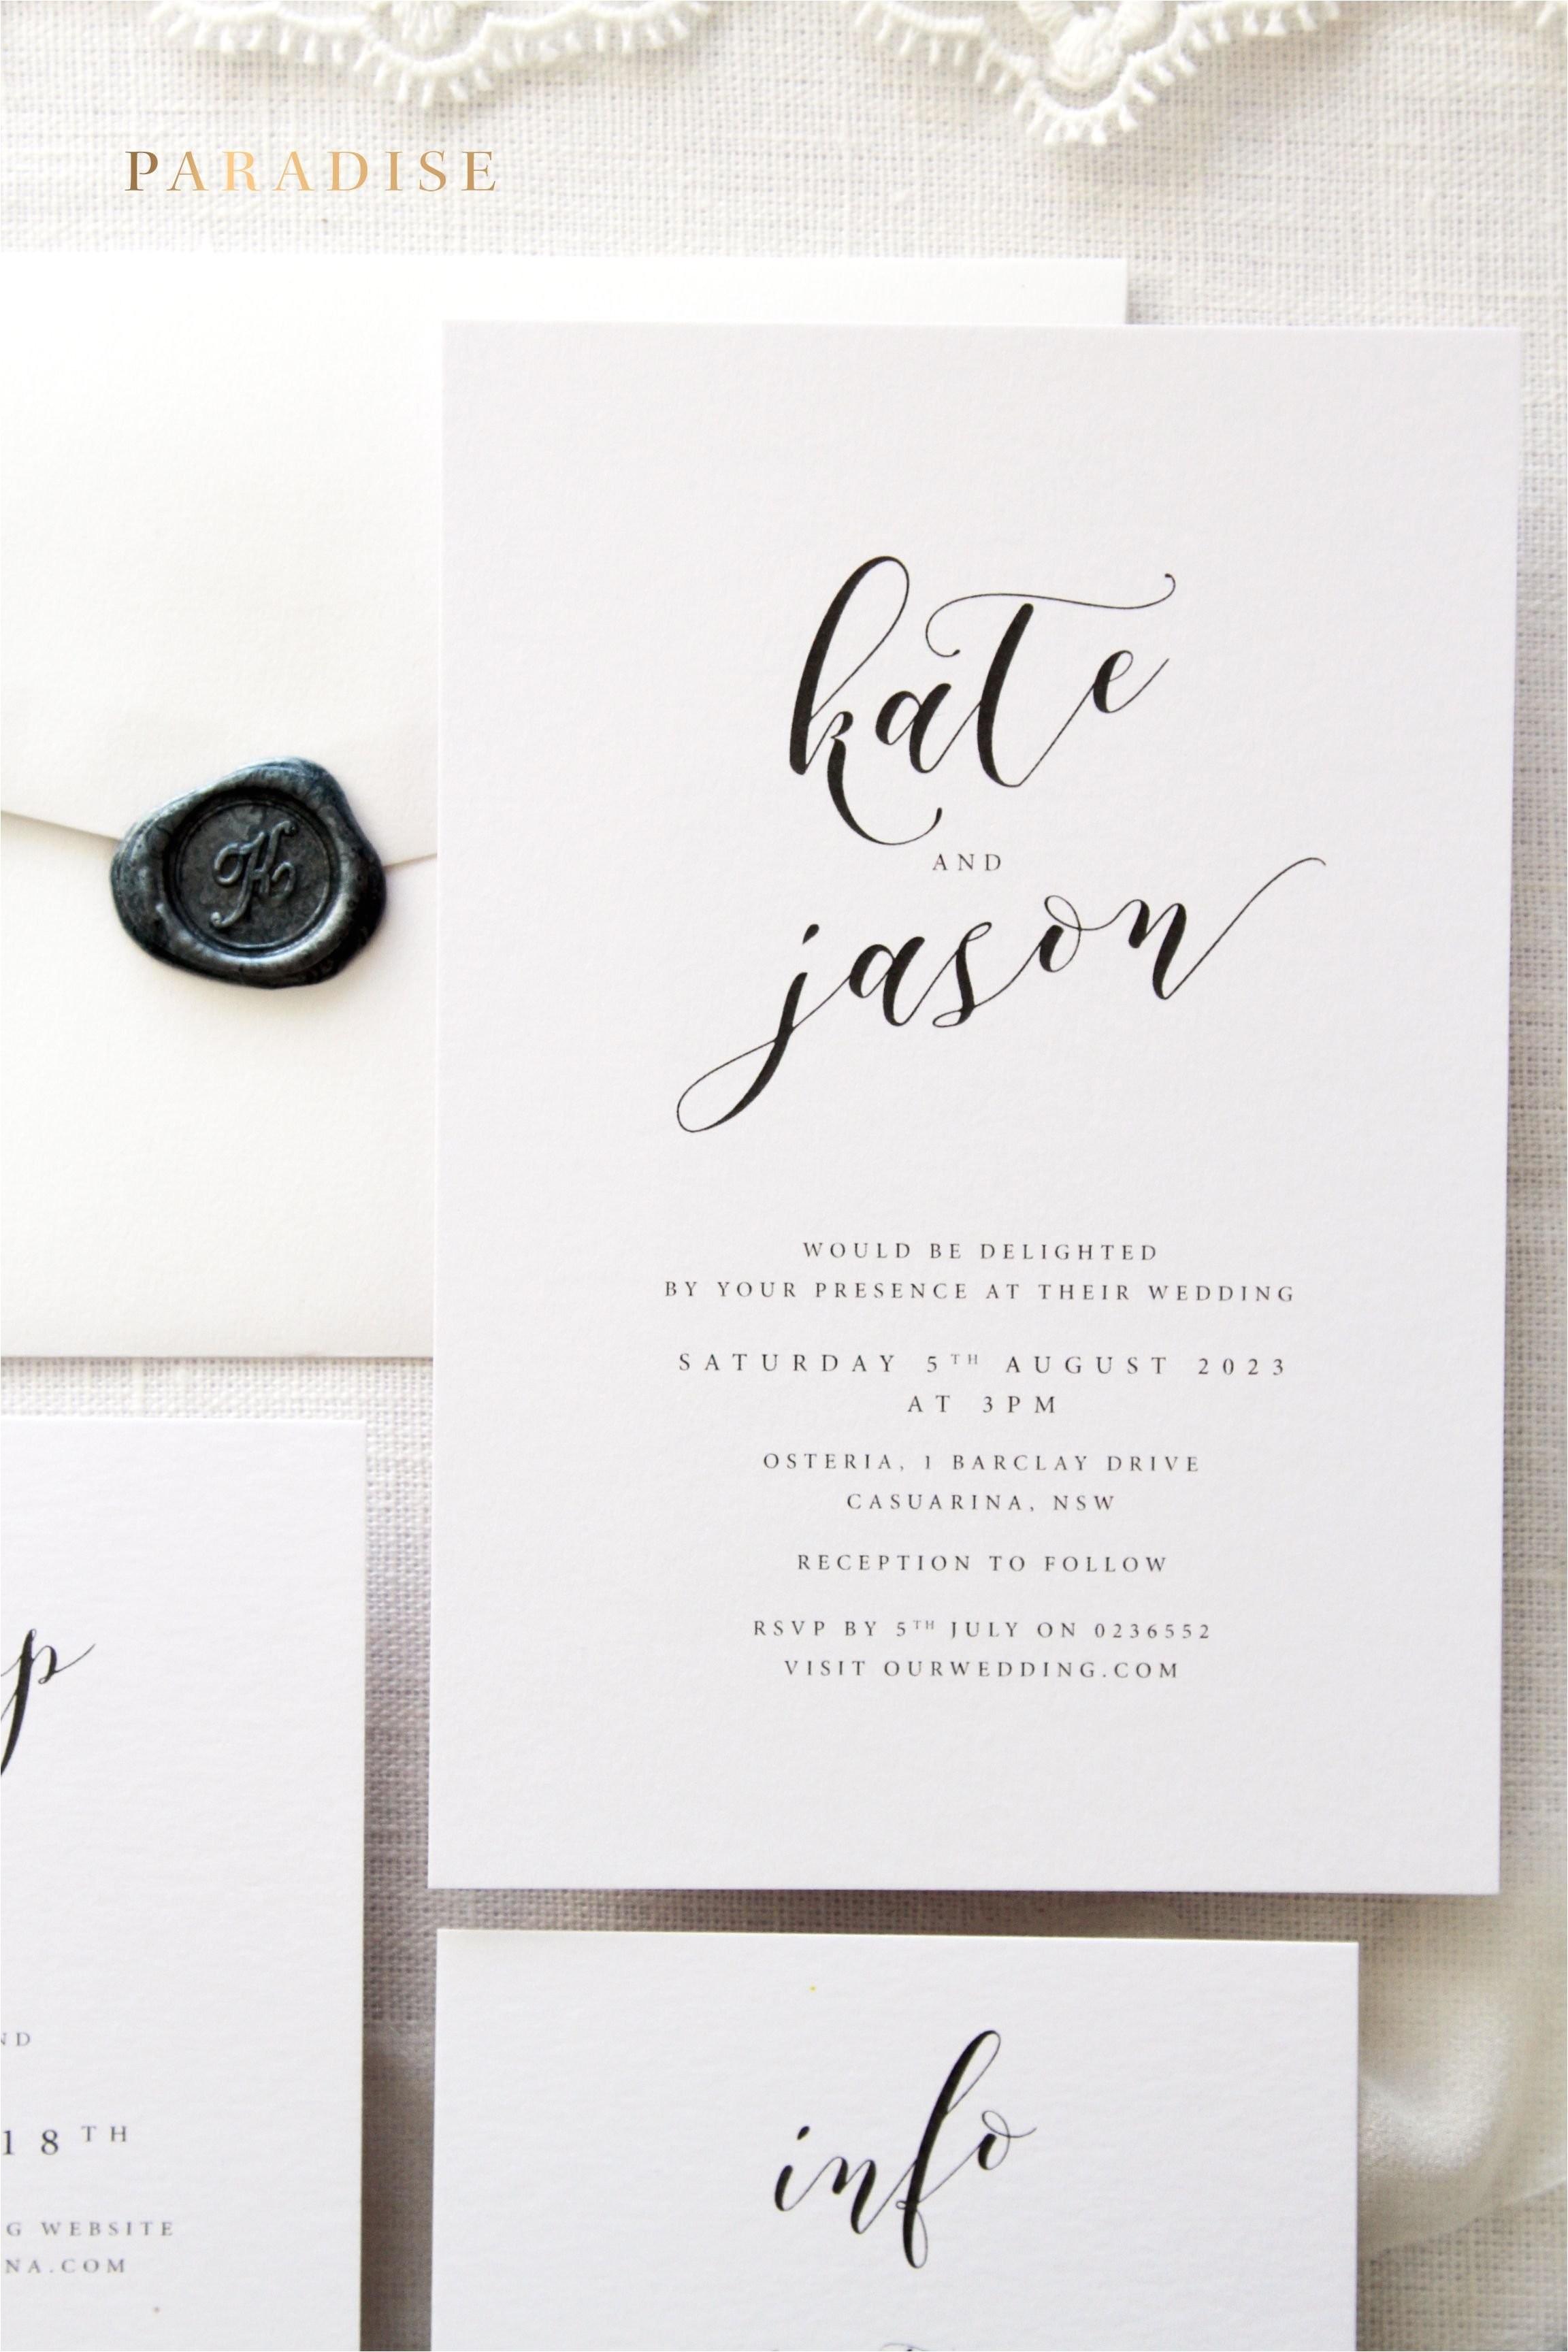 truly romantic wedding invitations